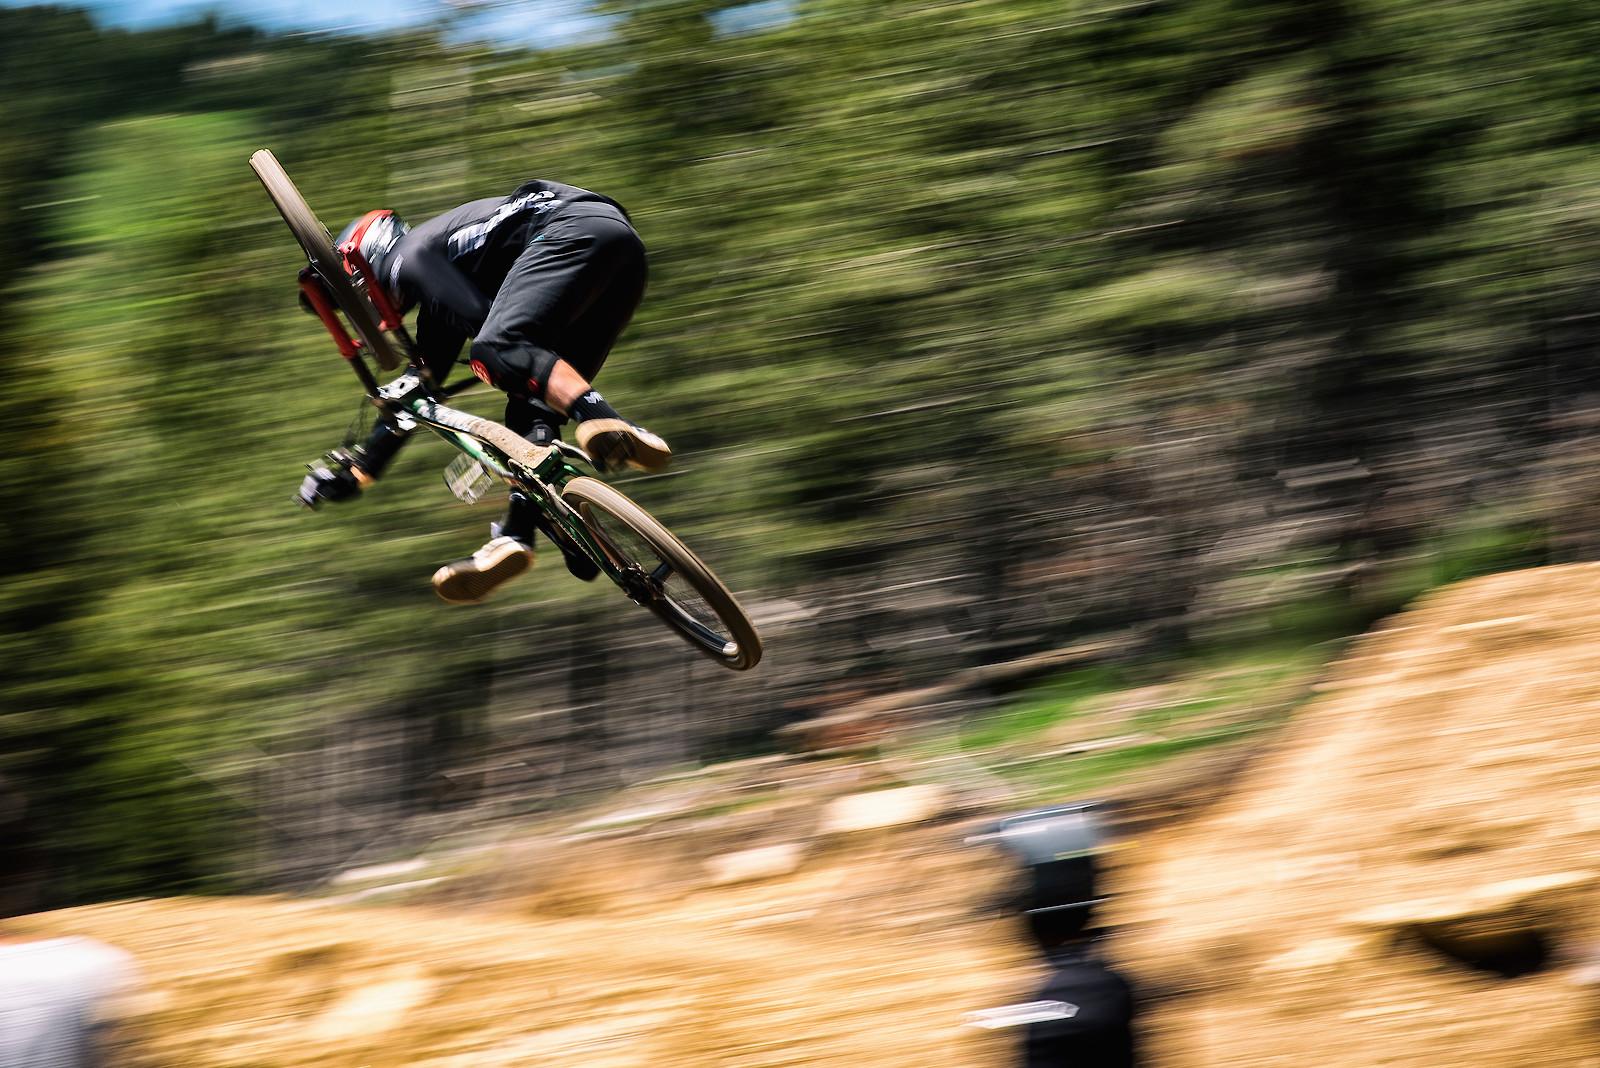 Kyle Strait - Les Angles (FR) - NicoBrizin - Mountain Biking Pictures - Vital MTB